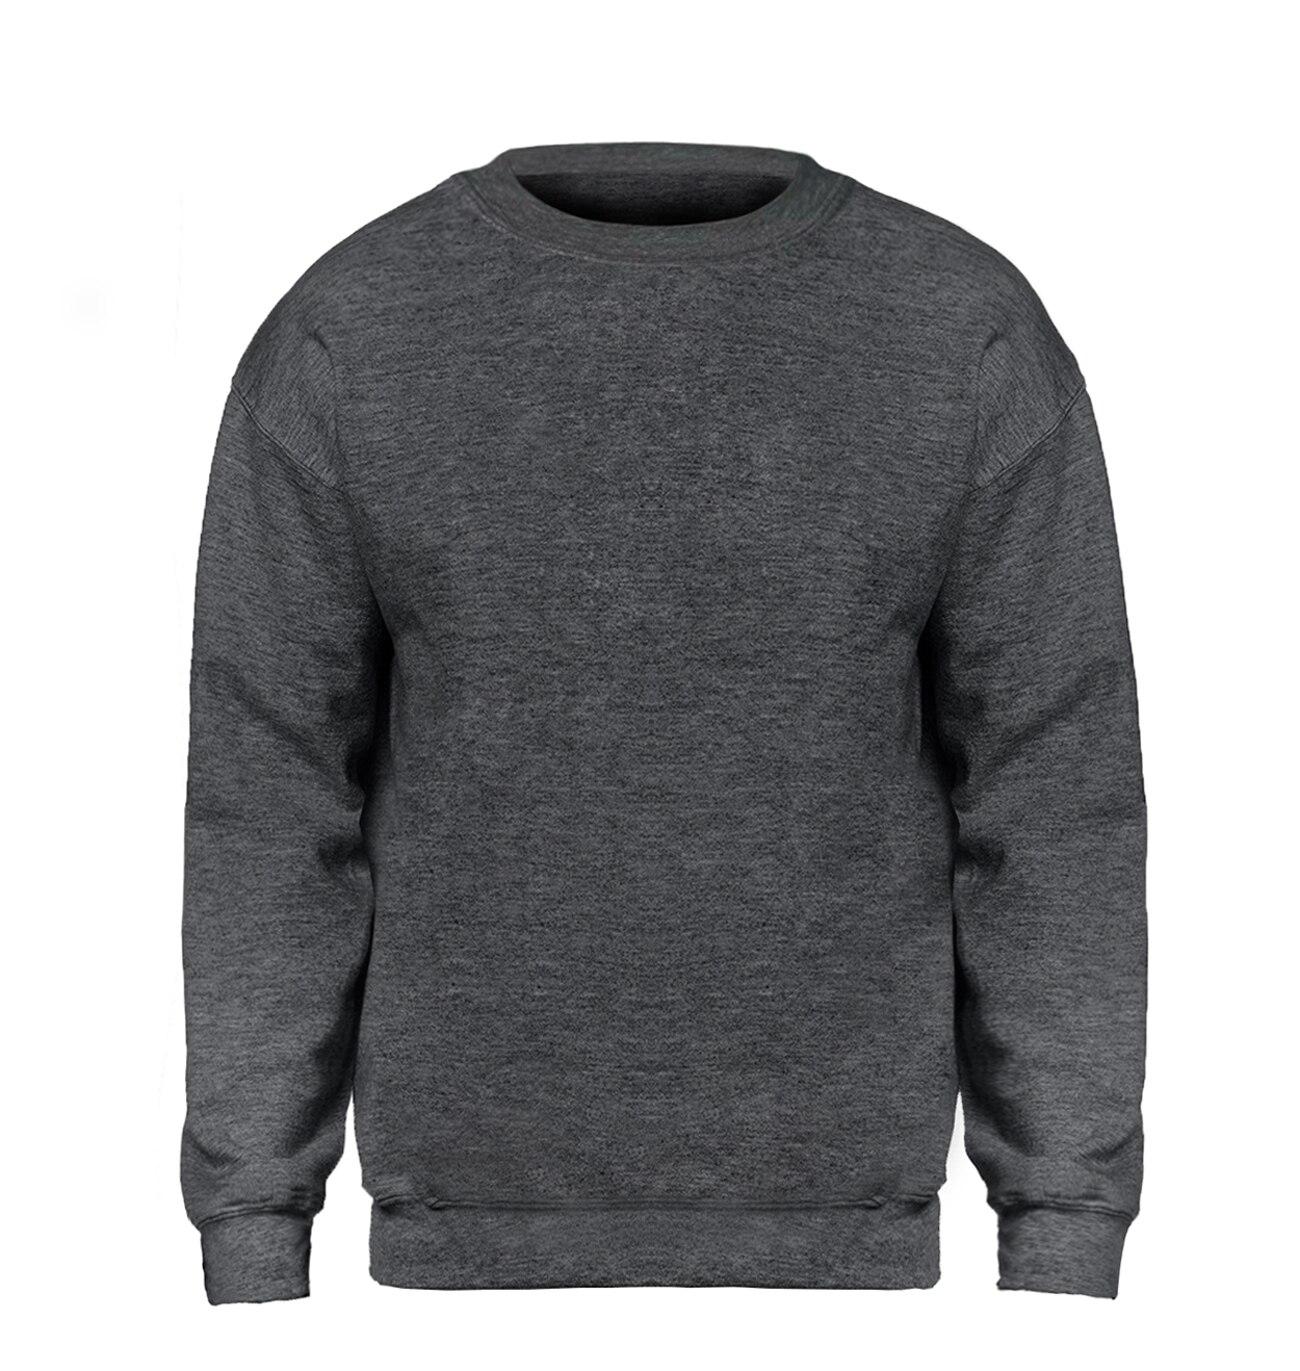 Solid color Sweatshirt Men Hoodie Crewneck Sweatshirts Winter Autumn Fleece Hoody Casual Gray Blue Red Black White Streetwear 23